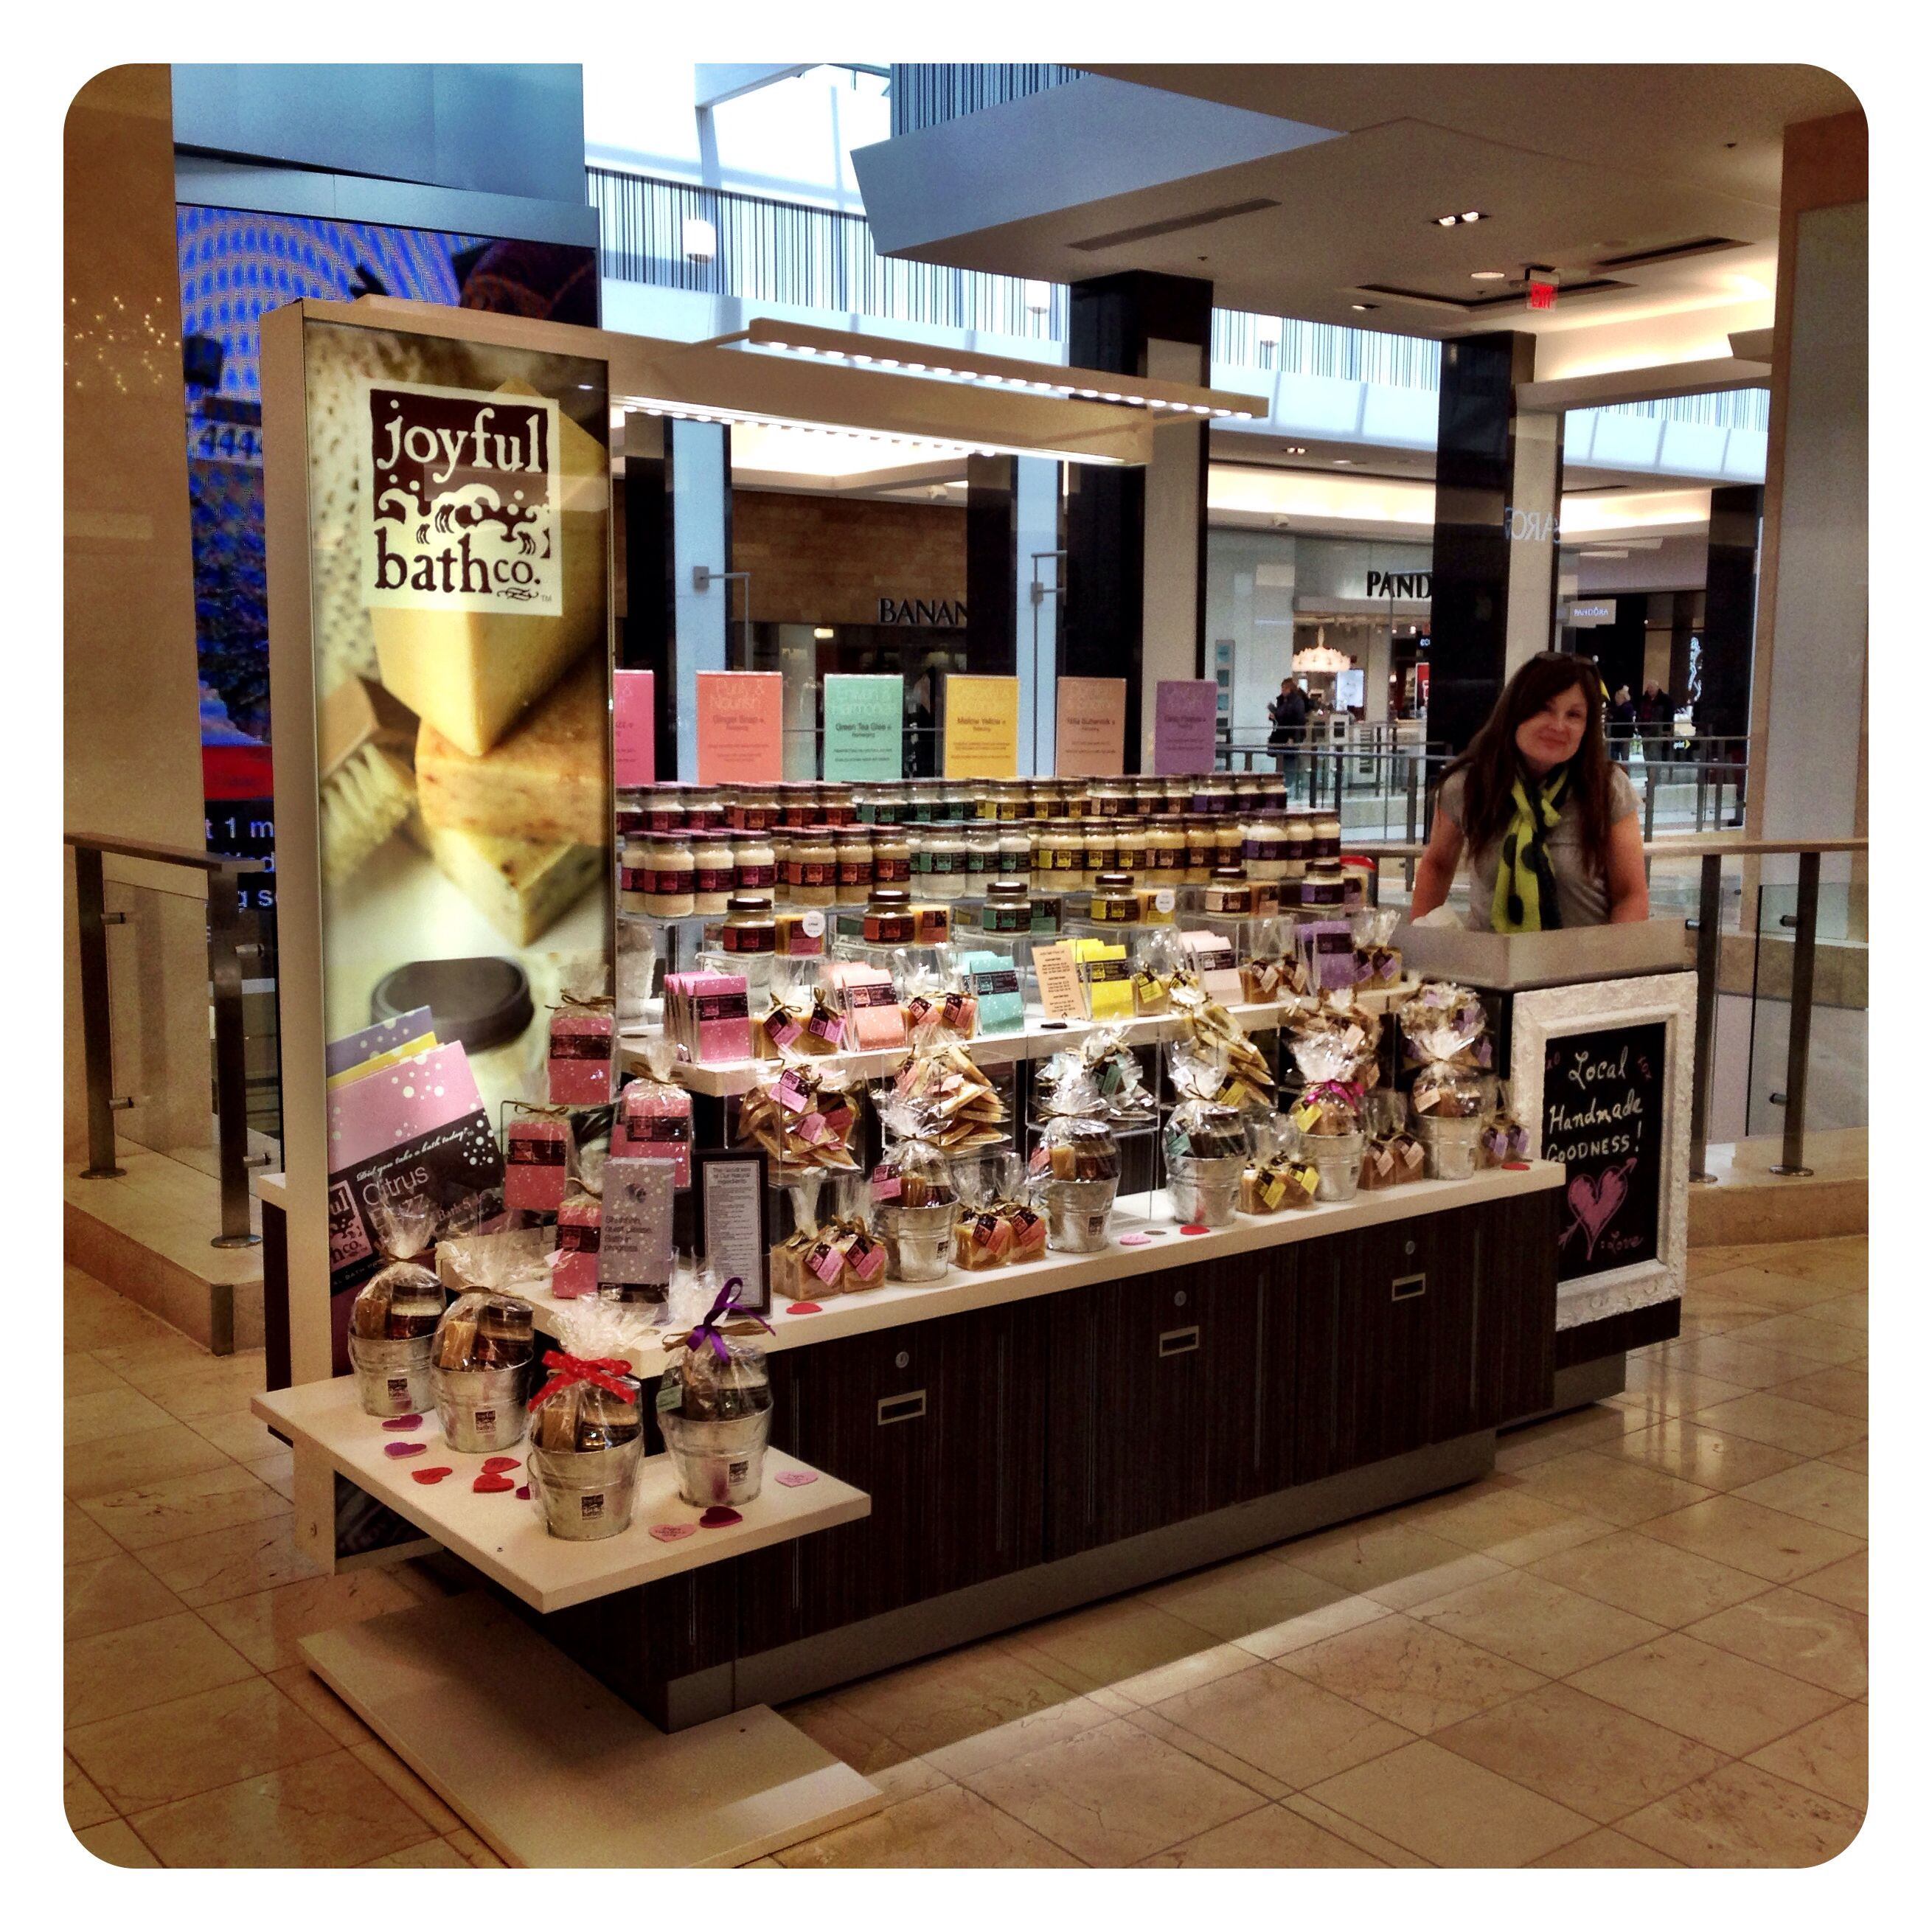 Joyful Bath Co. RMU Cart - Westfield Montgomery   kiosks   Pinterest ...